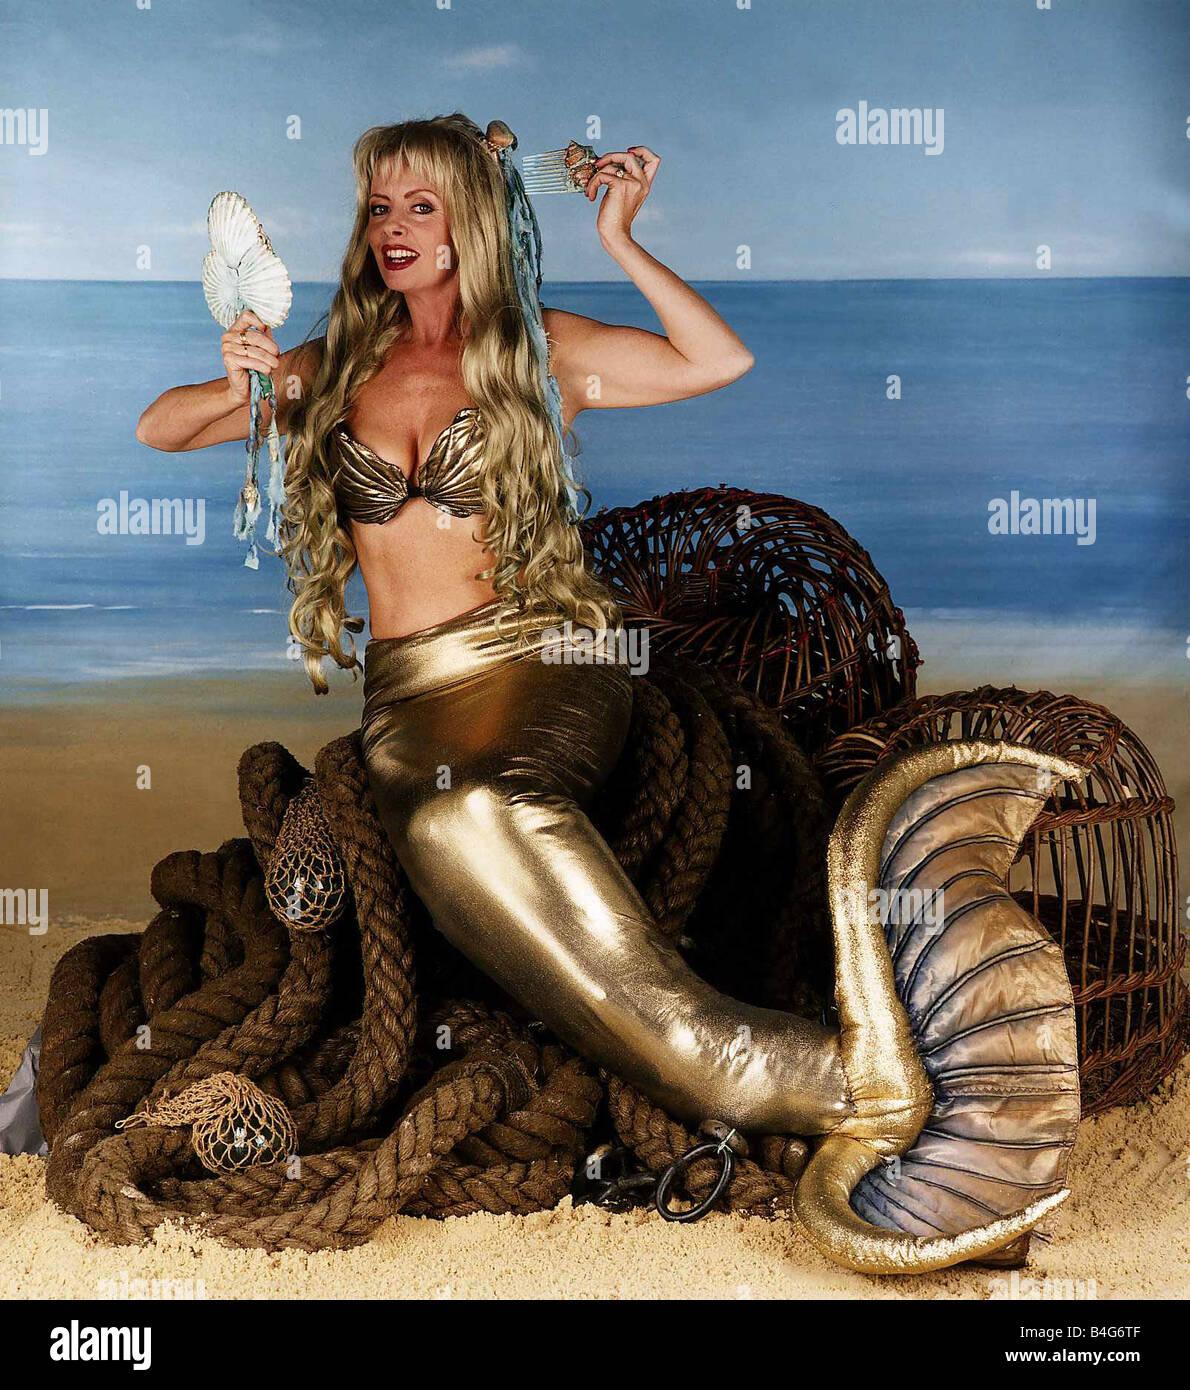 vicki michelle the actress from allo allo mermaid stock